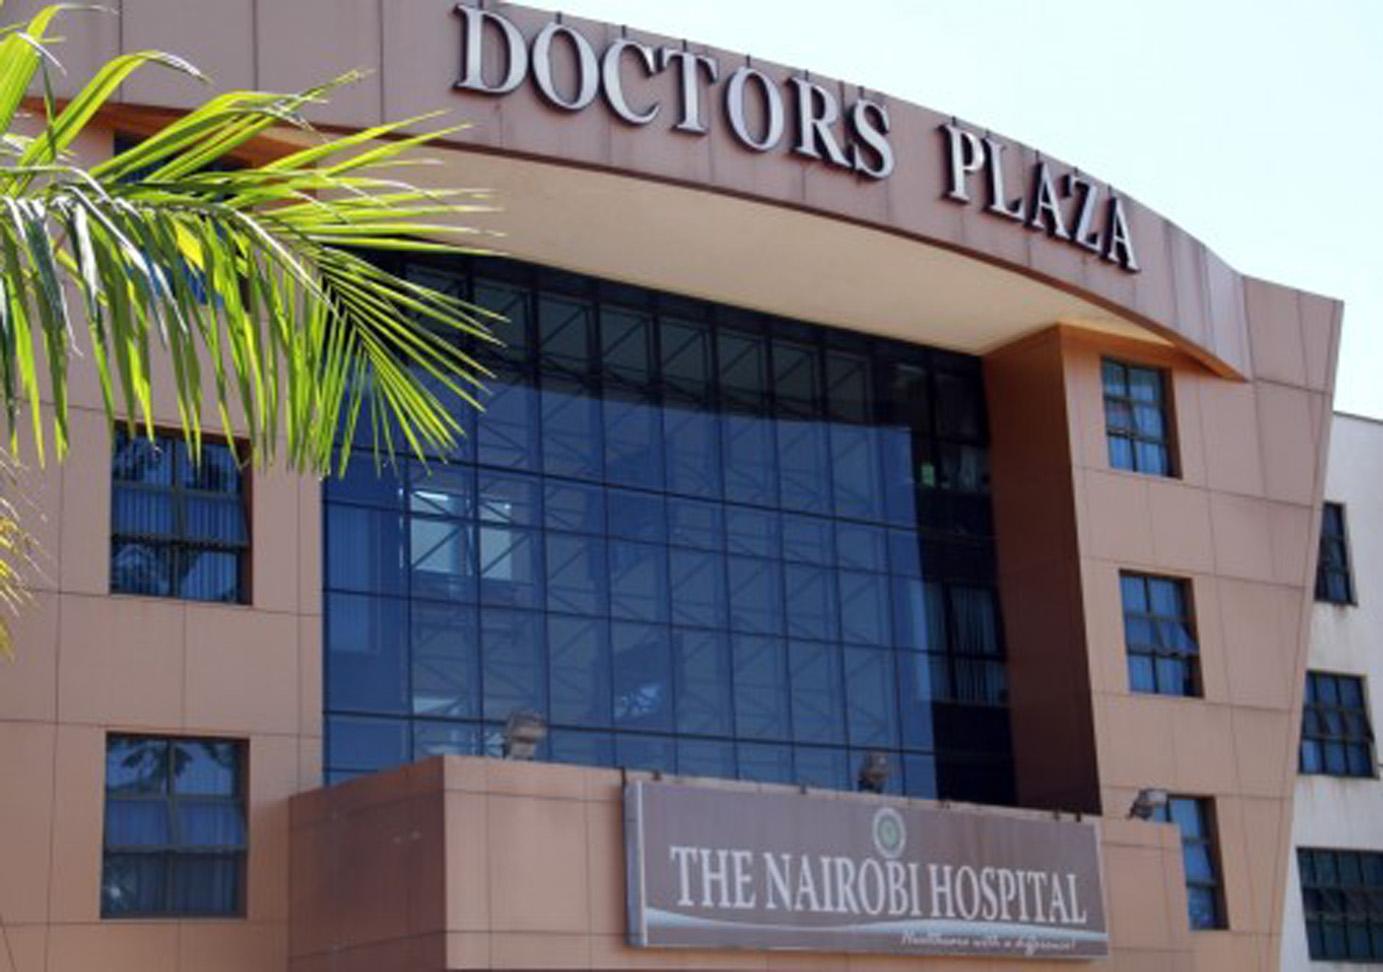 Nairobi-Hospital-Doctors-Plaza.jpg